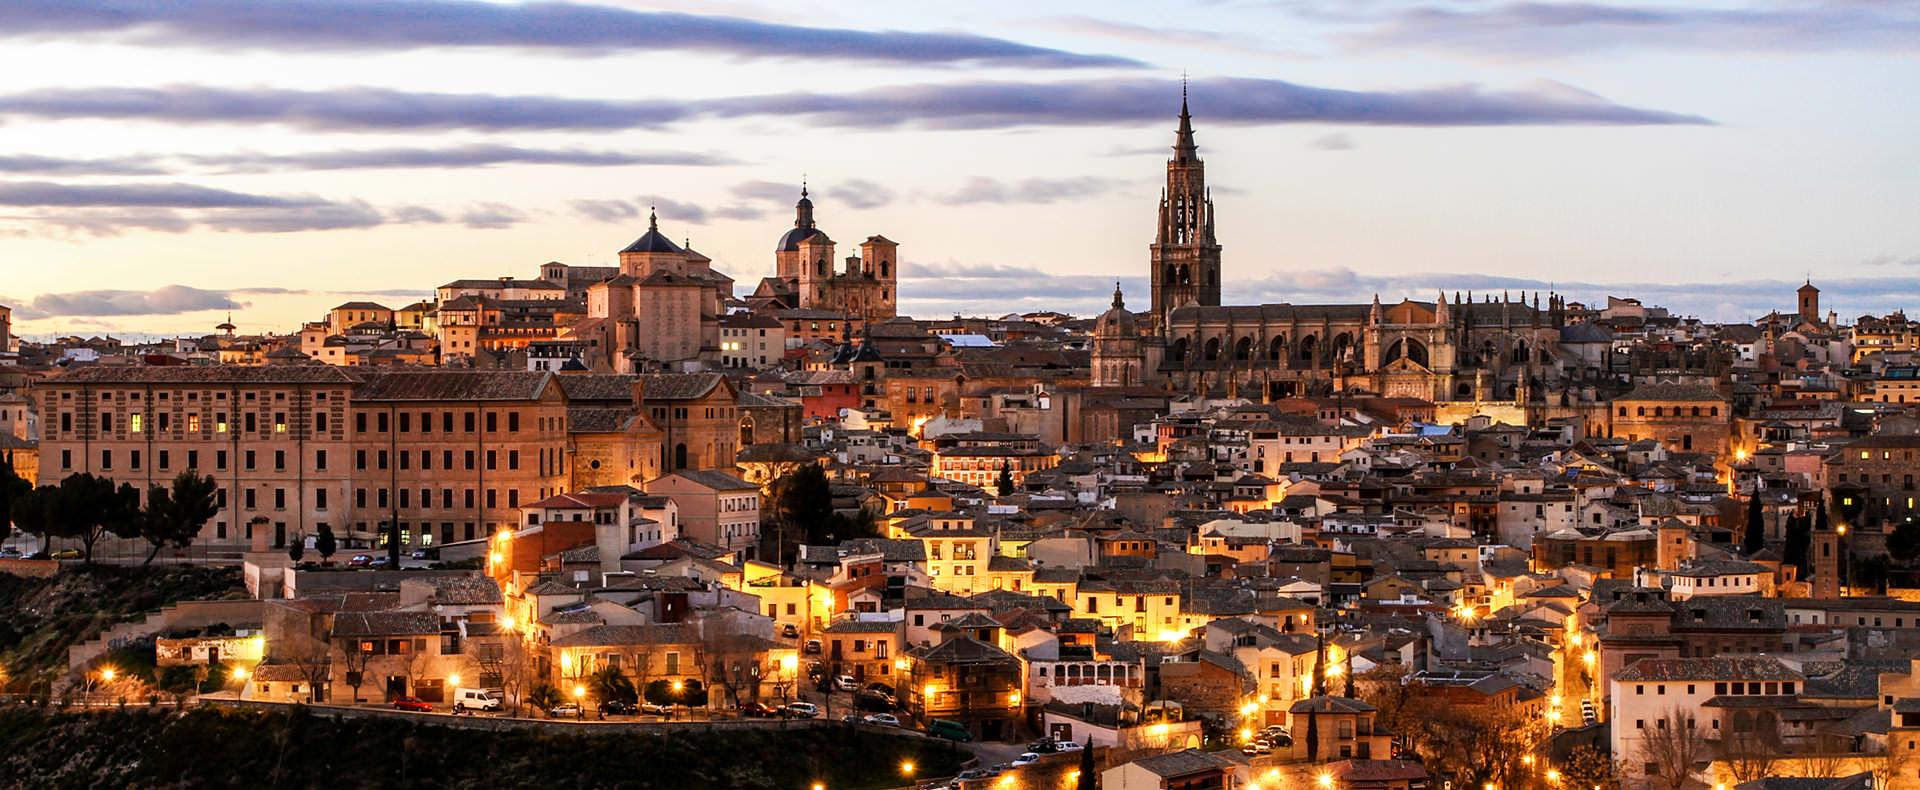 Spain, Toledo